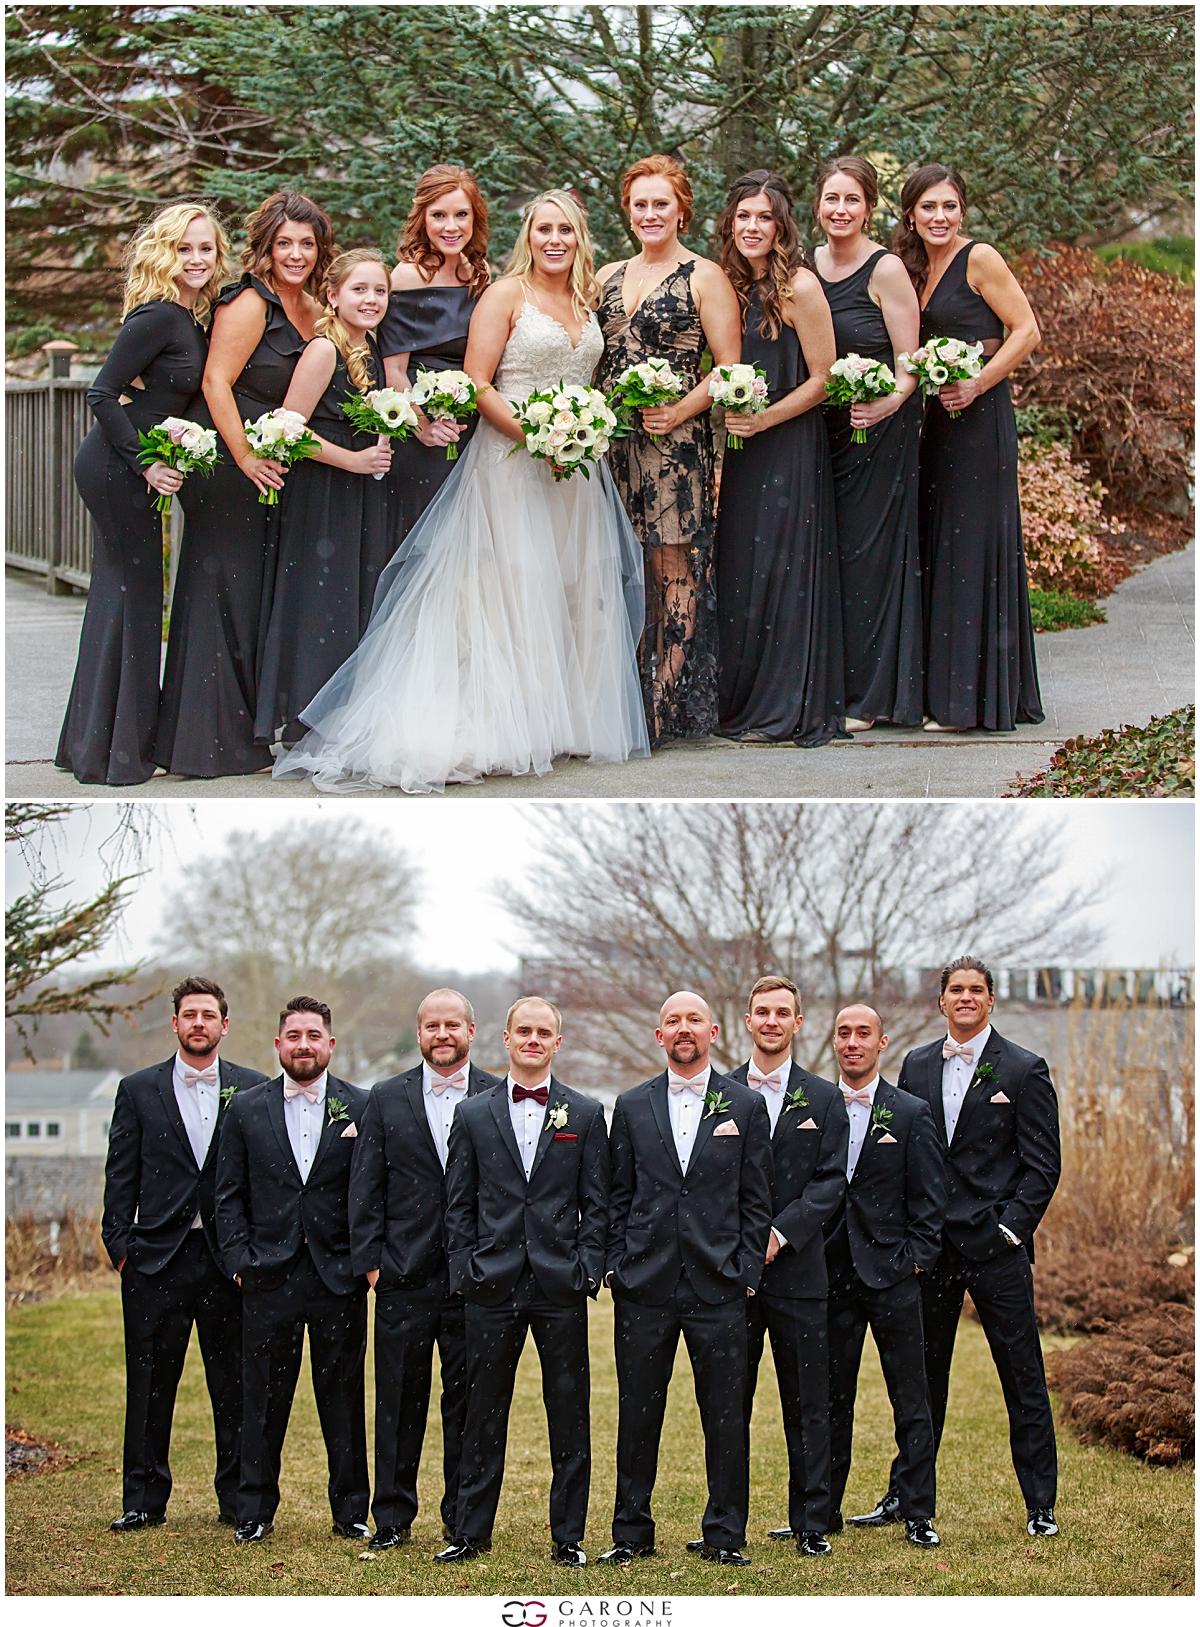 Brooke_Kenzie_Red_Lion_Inn_Cohasset_Ma_Boston_Wedding_Photographer_0068.jpg